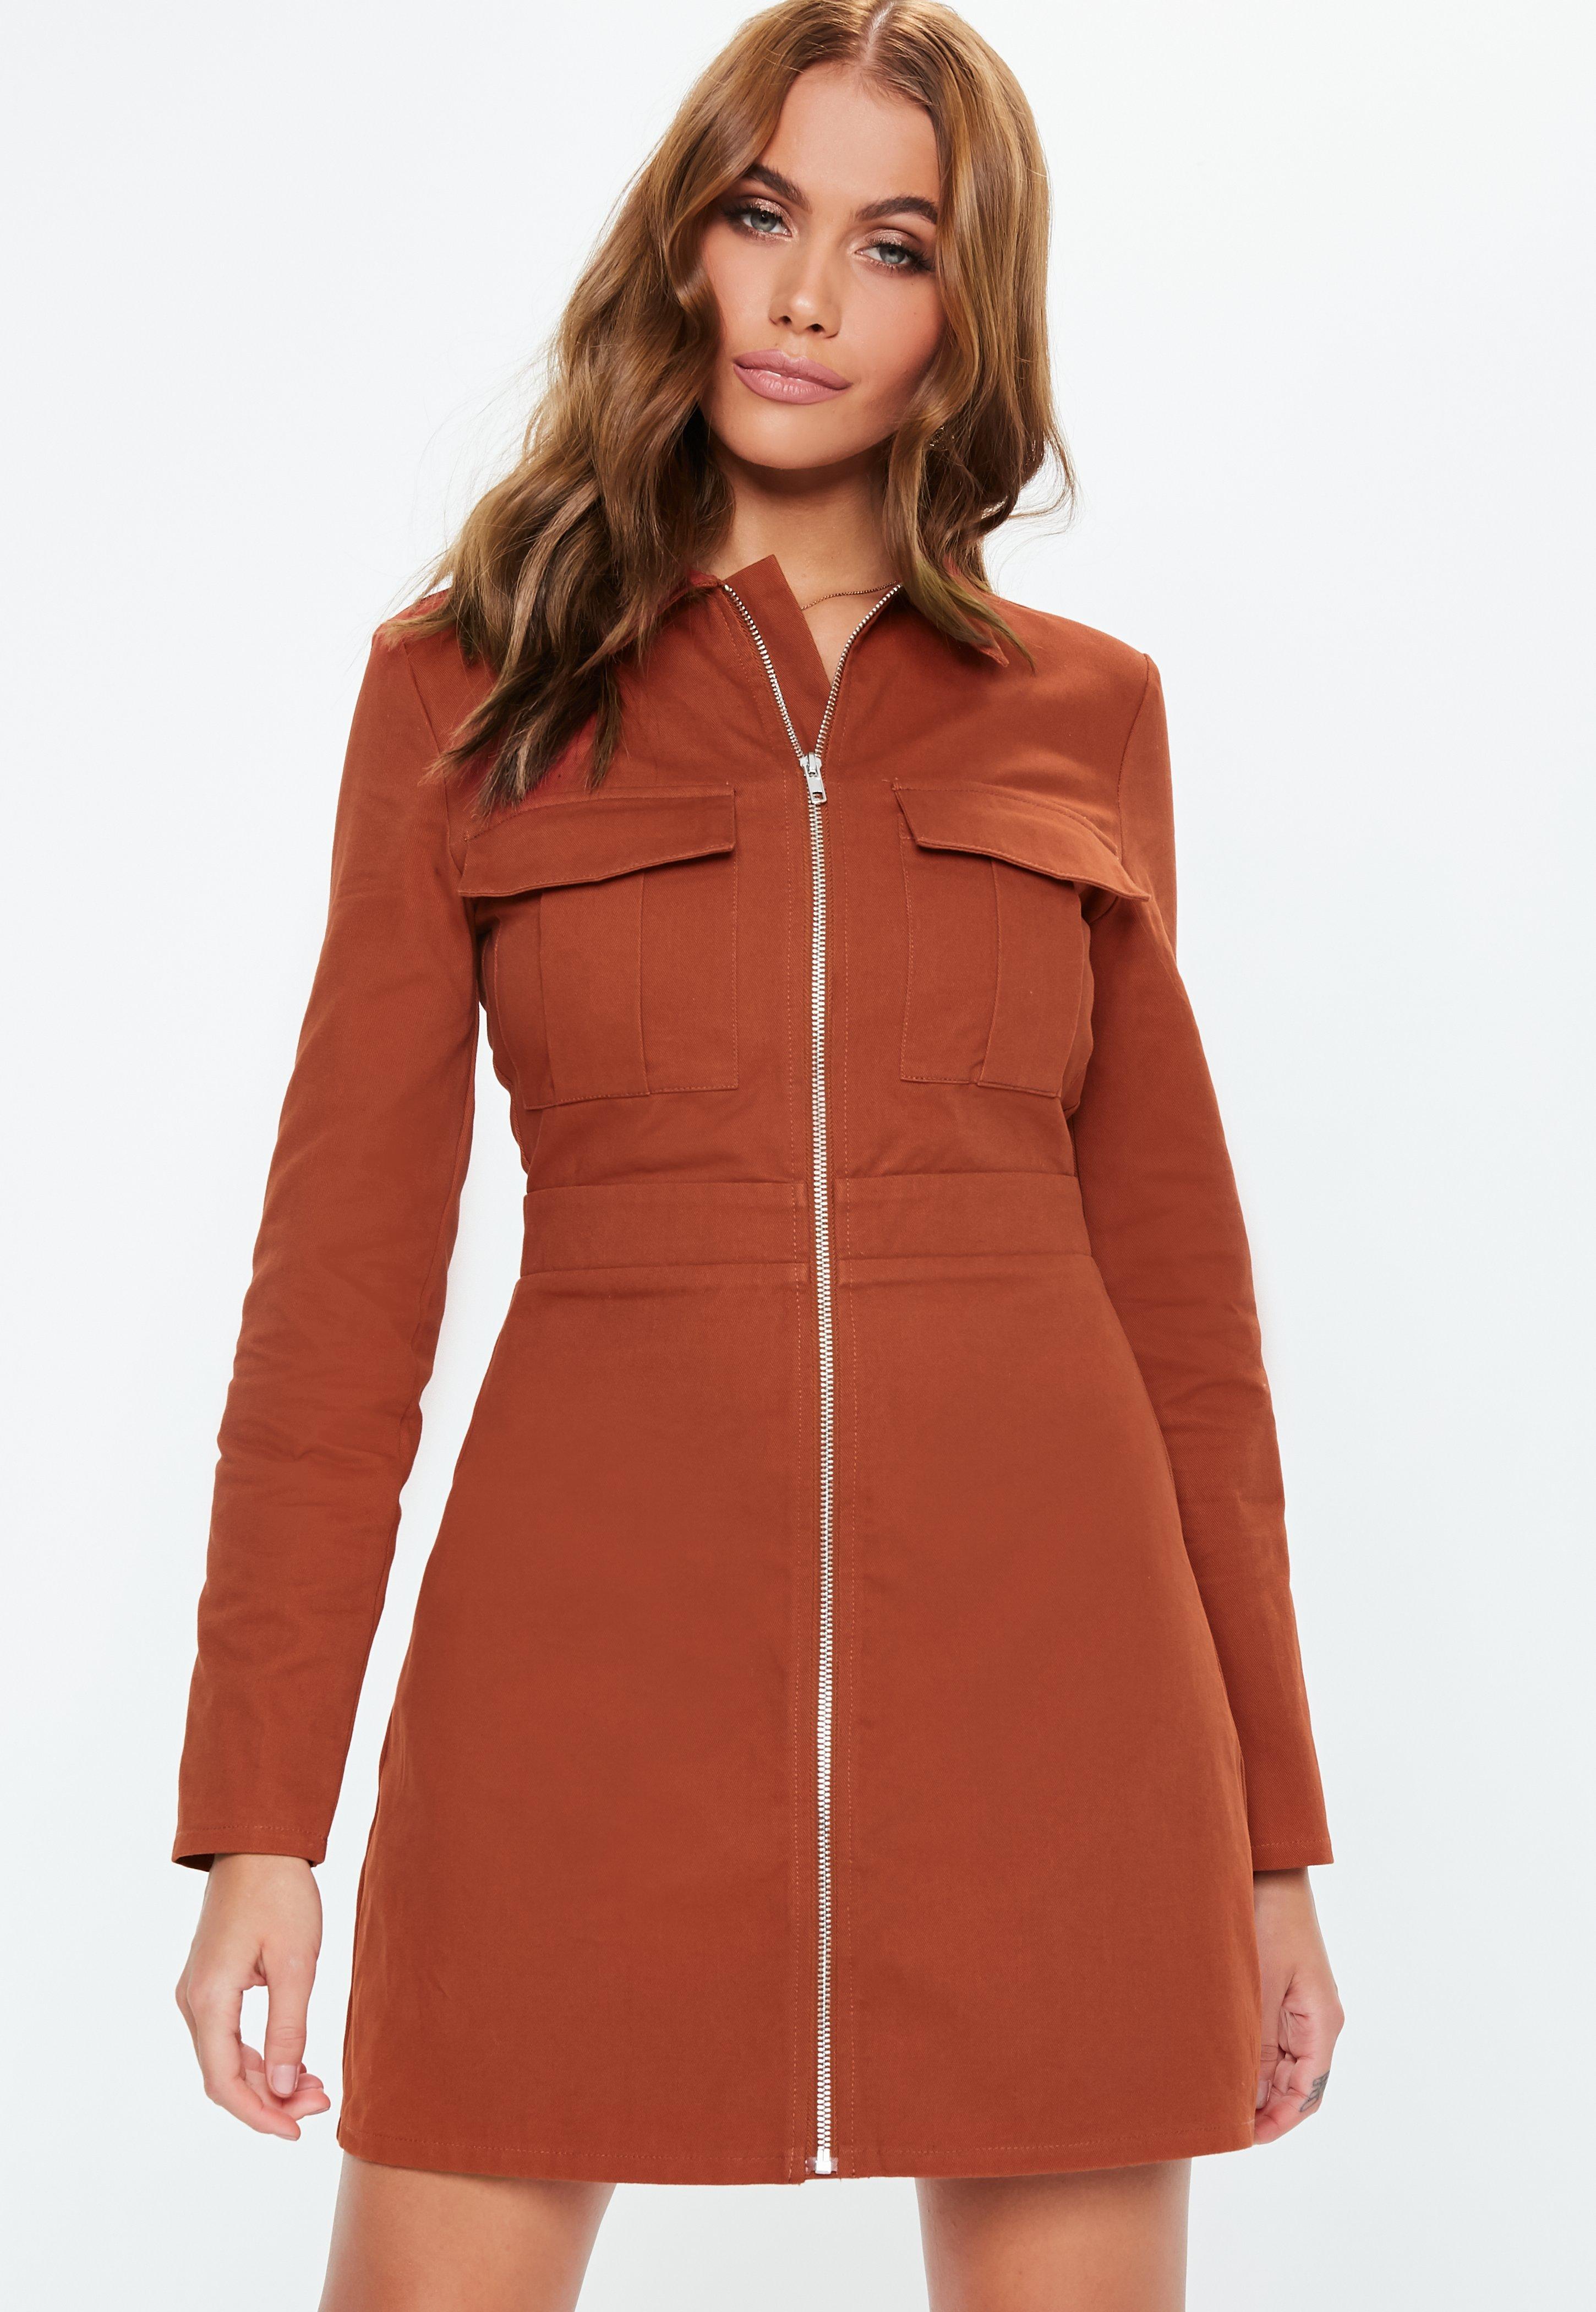 fbe3b2af0686 Rust Zip Through Skater Shirt Dress